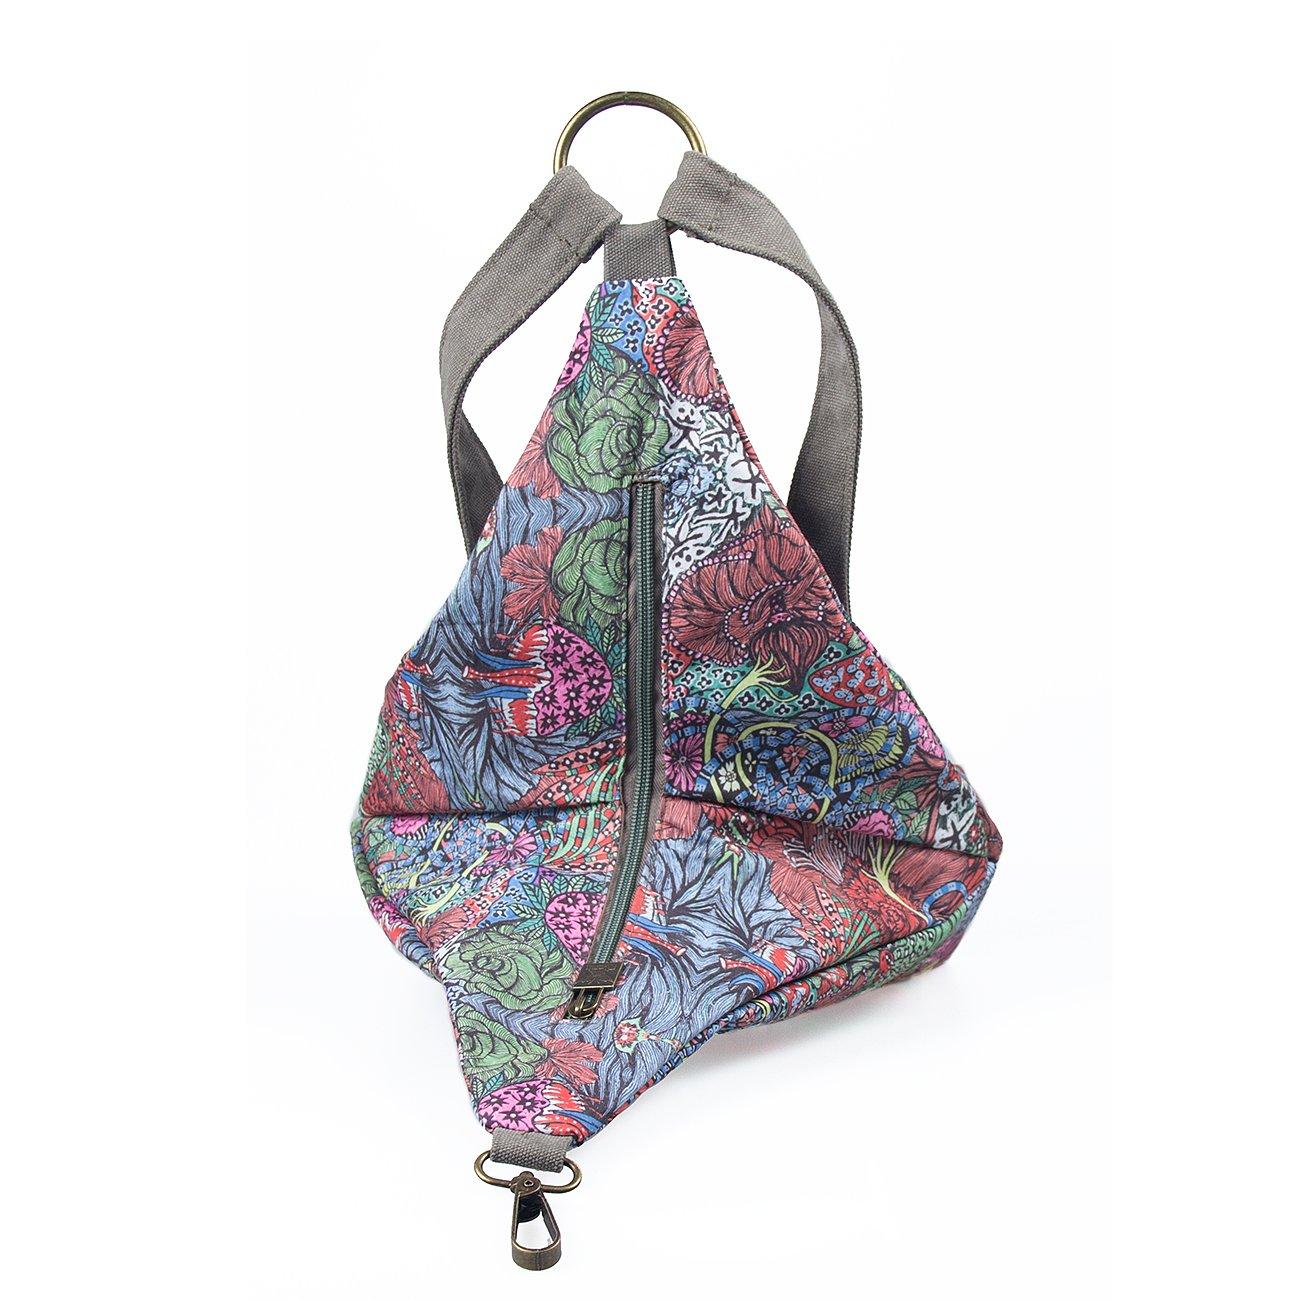 Amazon.com: Black Butterfly - Mochila de lona para mujer ...